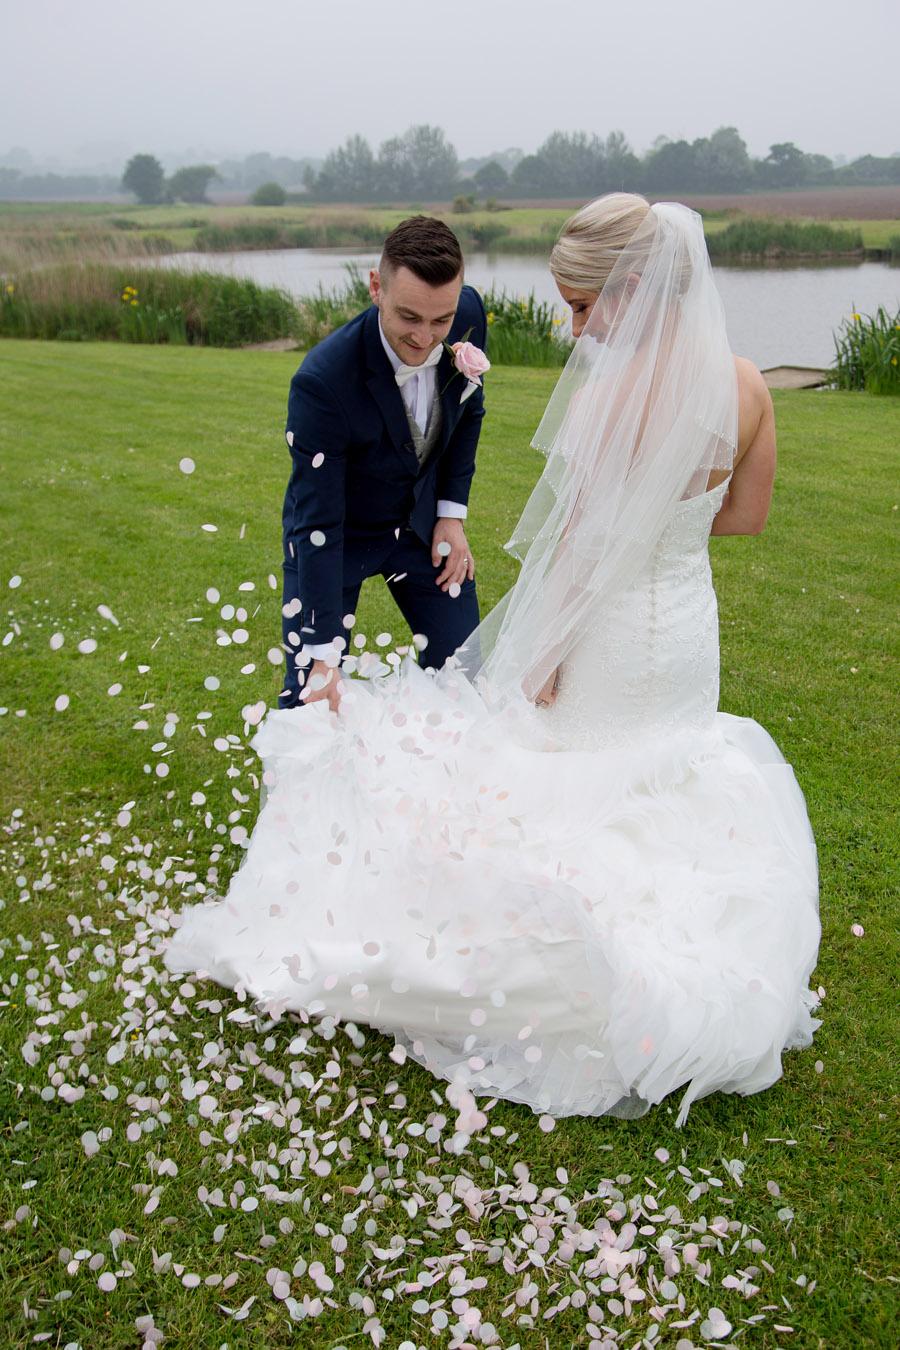 Quantock Lakes wedding styling ideas real wedding photographer Martin Dabek on the English Wedding Blog (9)